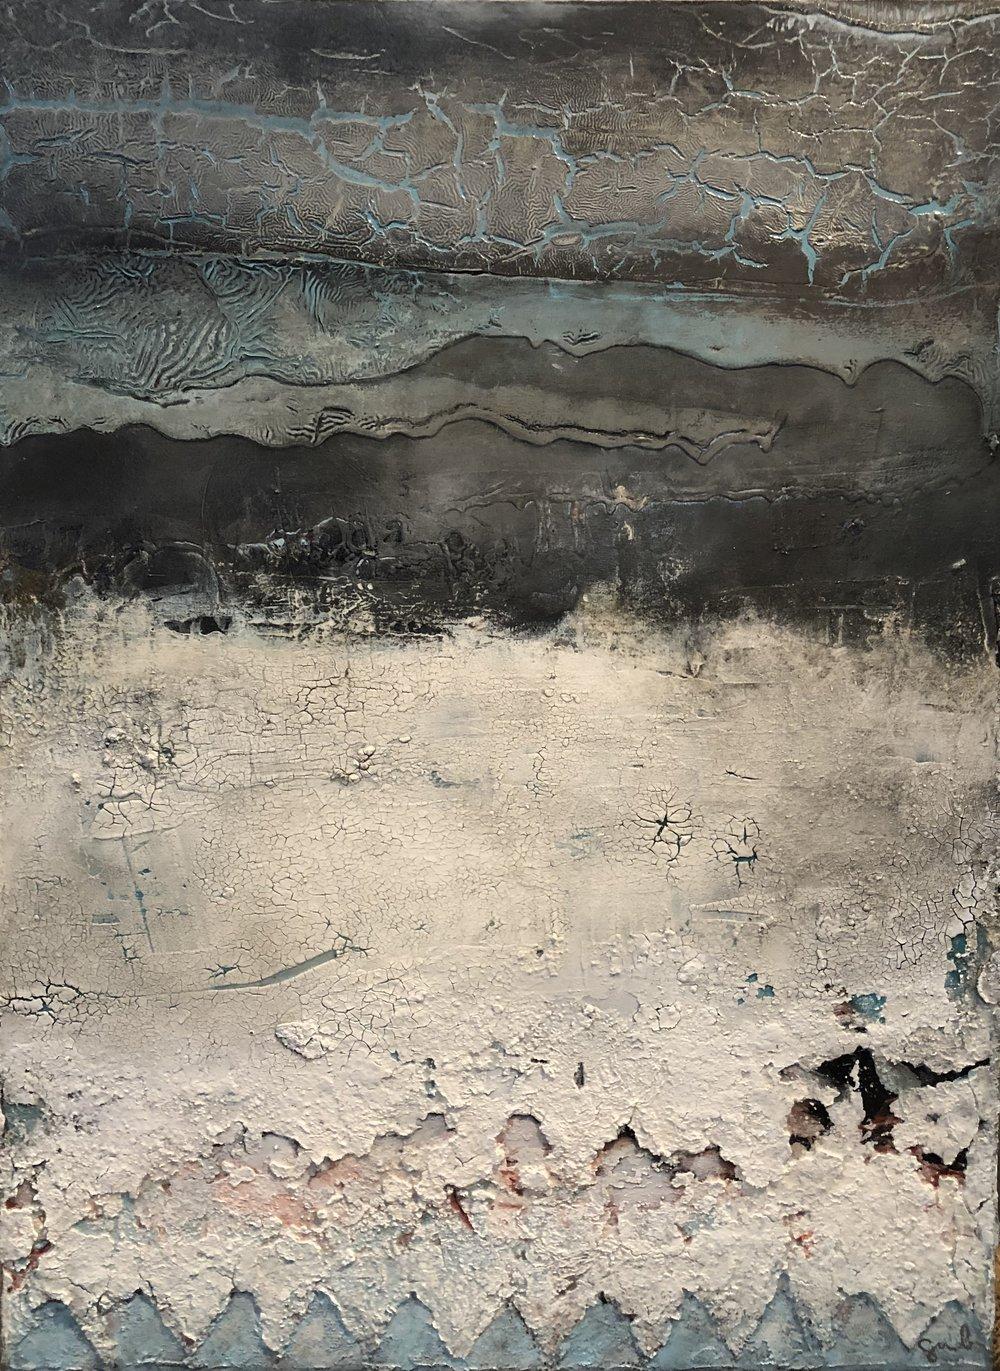 Untitled 7 by Gab Kokas